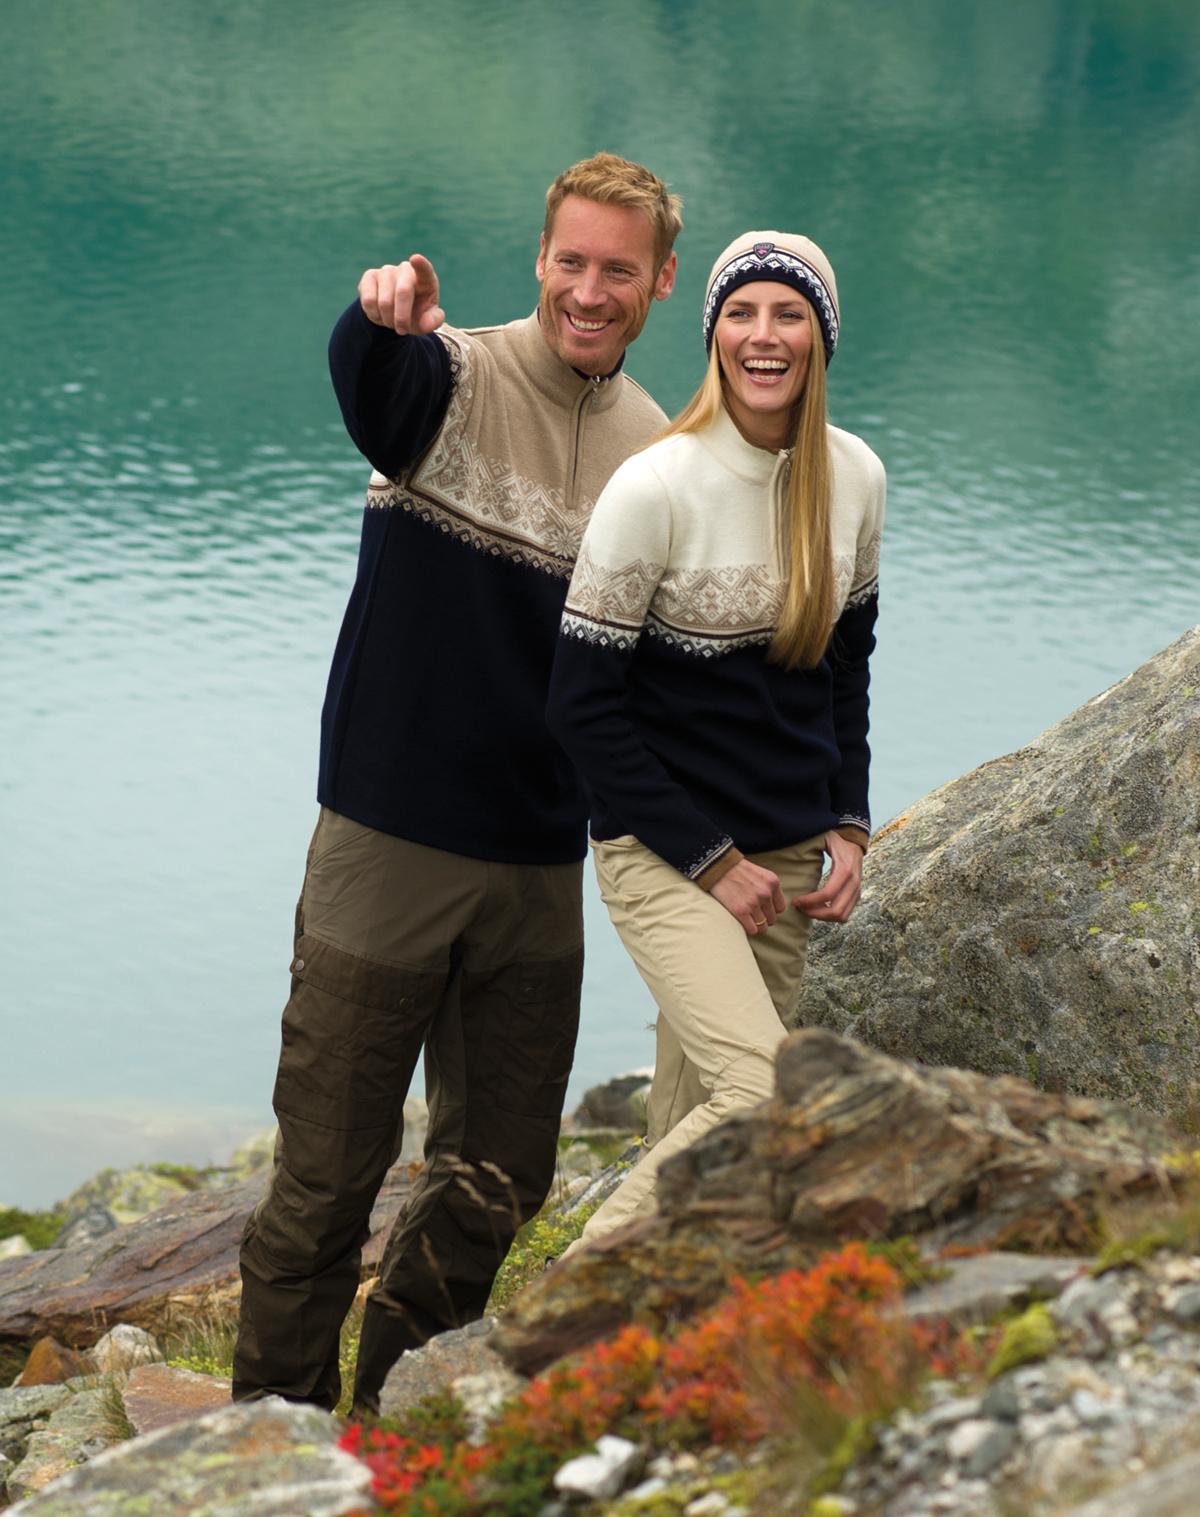 St.Moritz Women's Sweater (4)